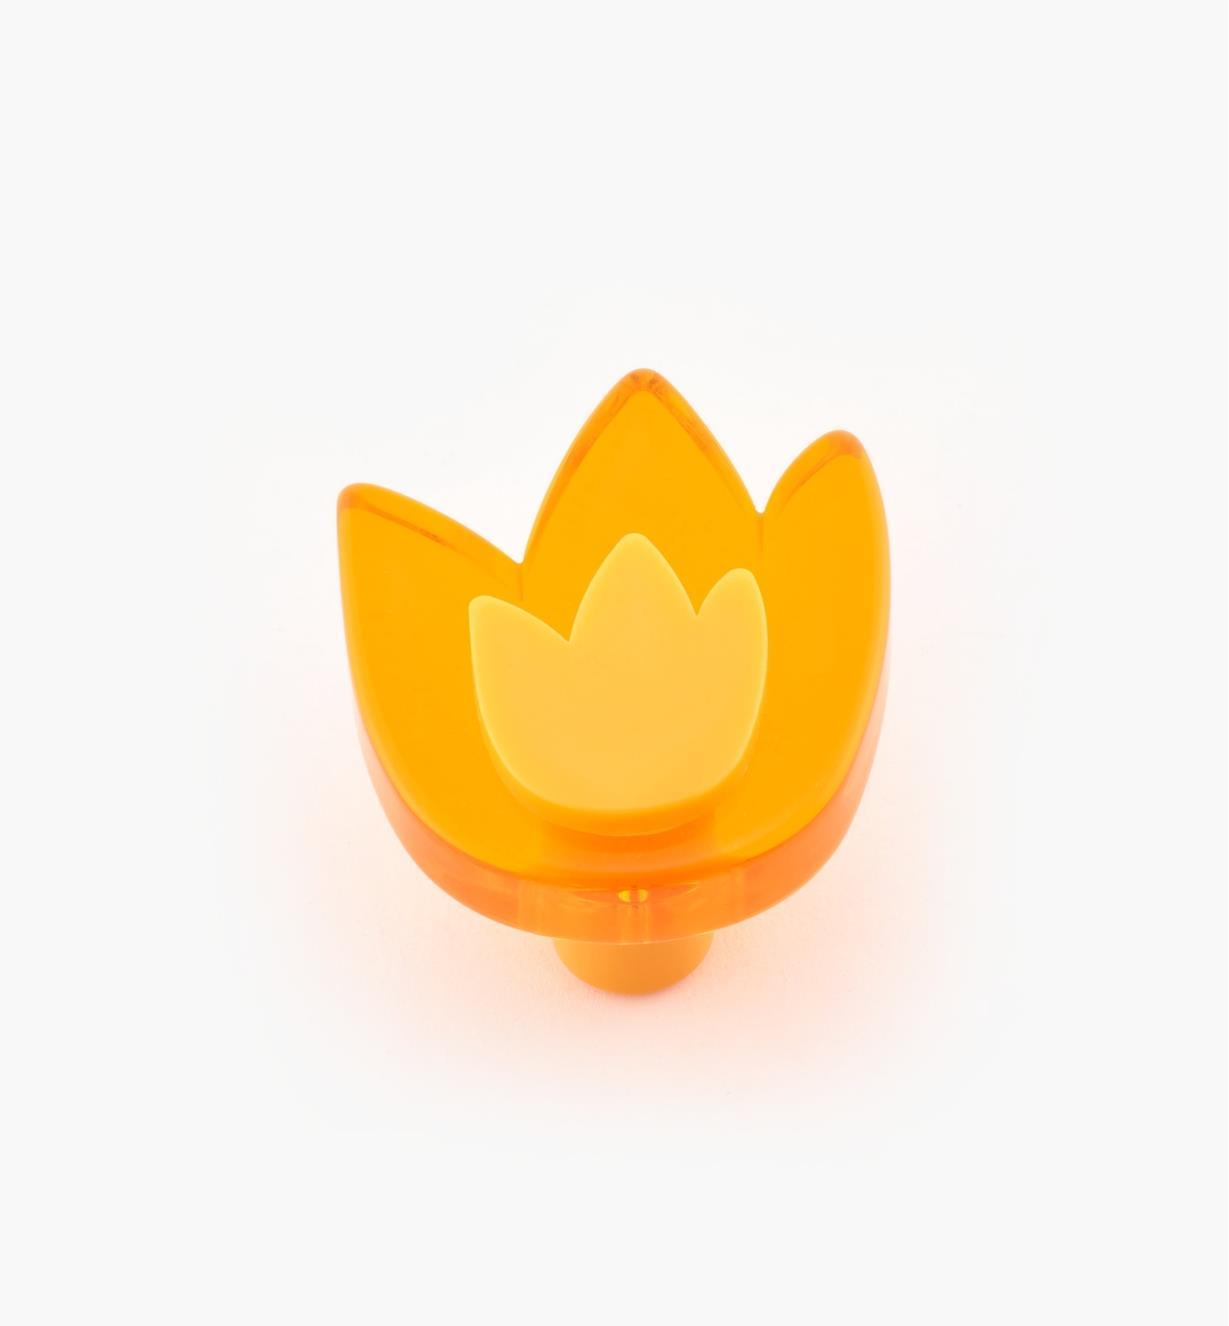 01W0573 - Tulip Knob, Orange